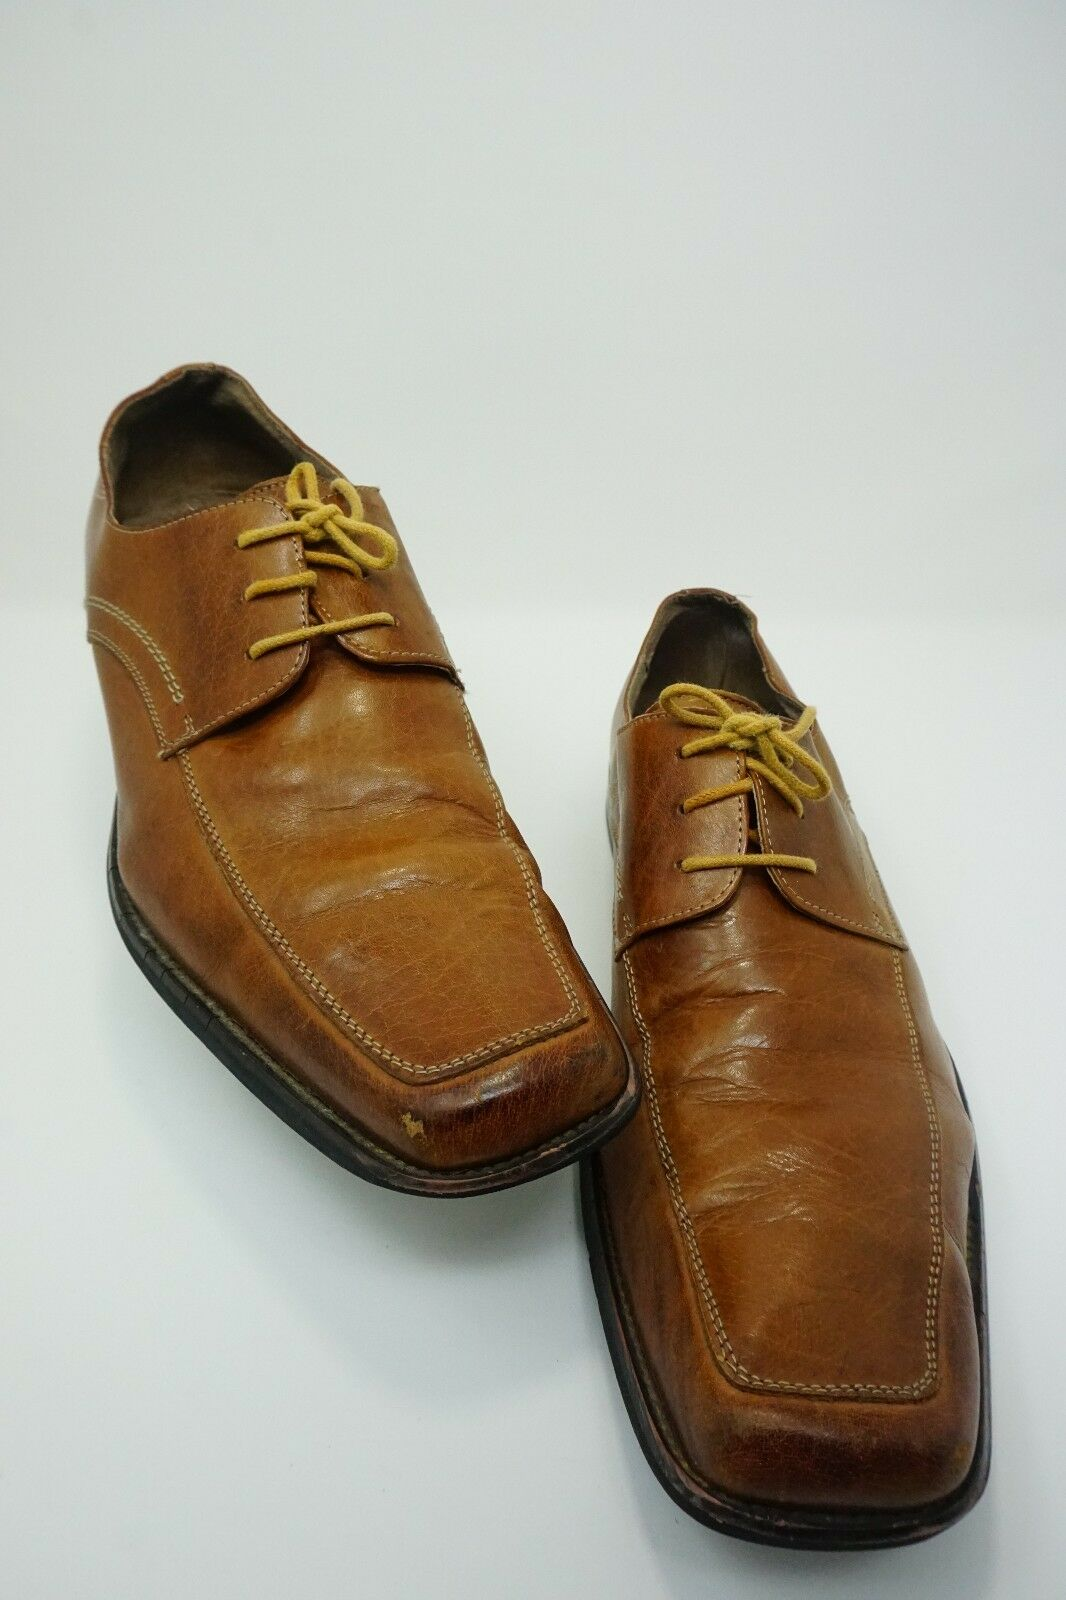 Men's Dress Fratelli Select Brown Leather Dress Men's Shoes Size 10.5 64ba17